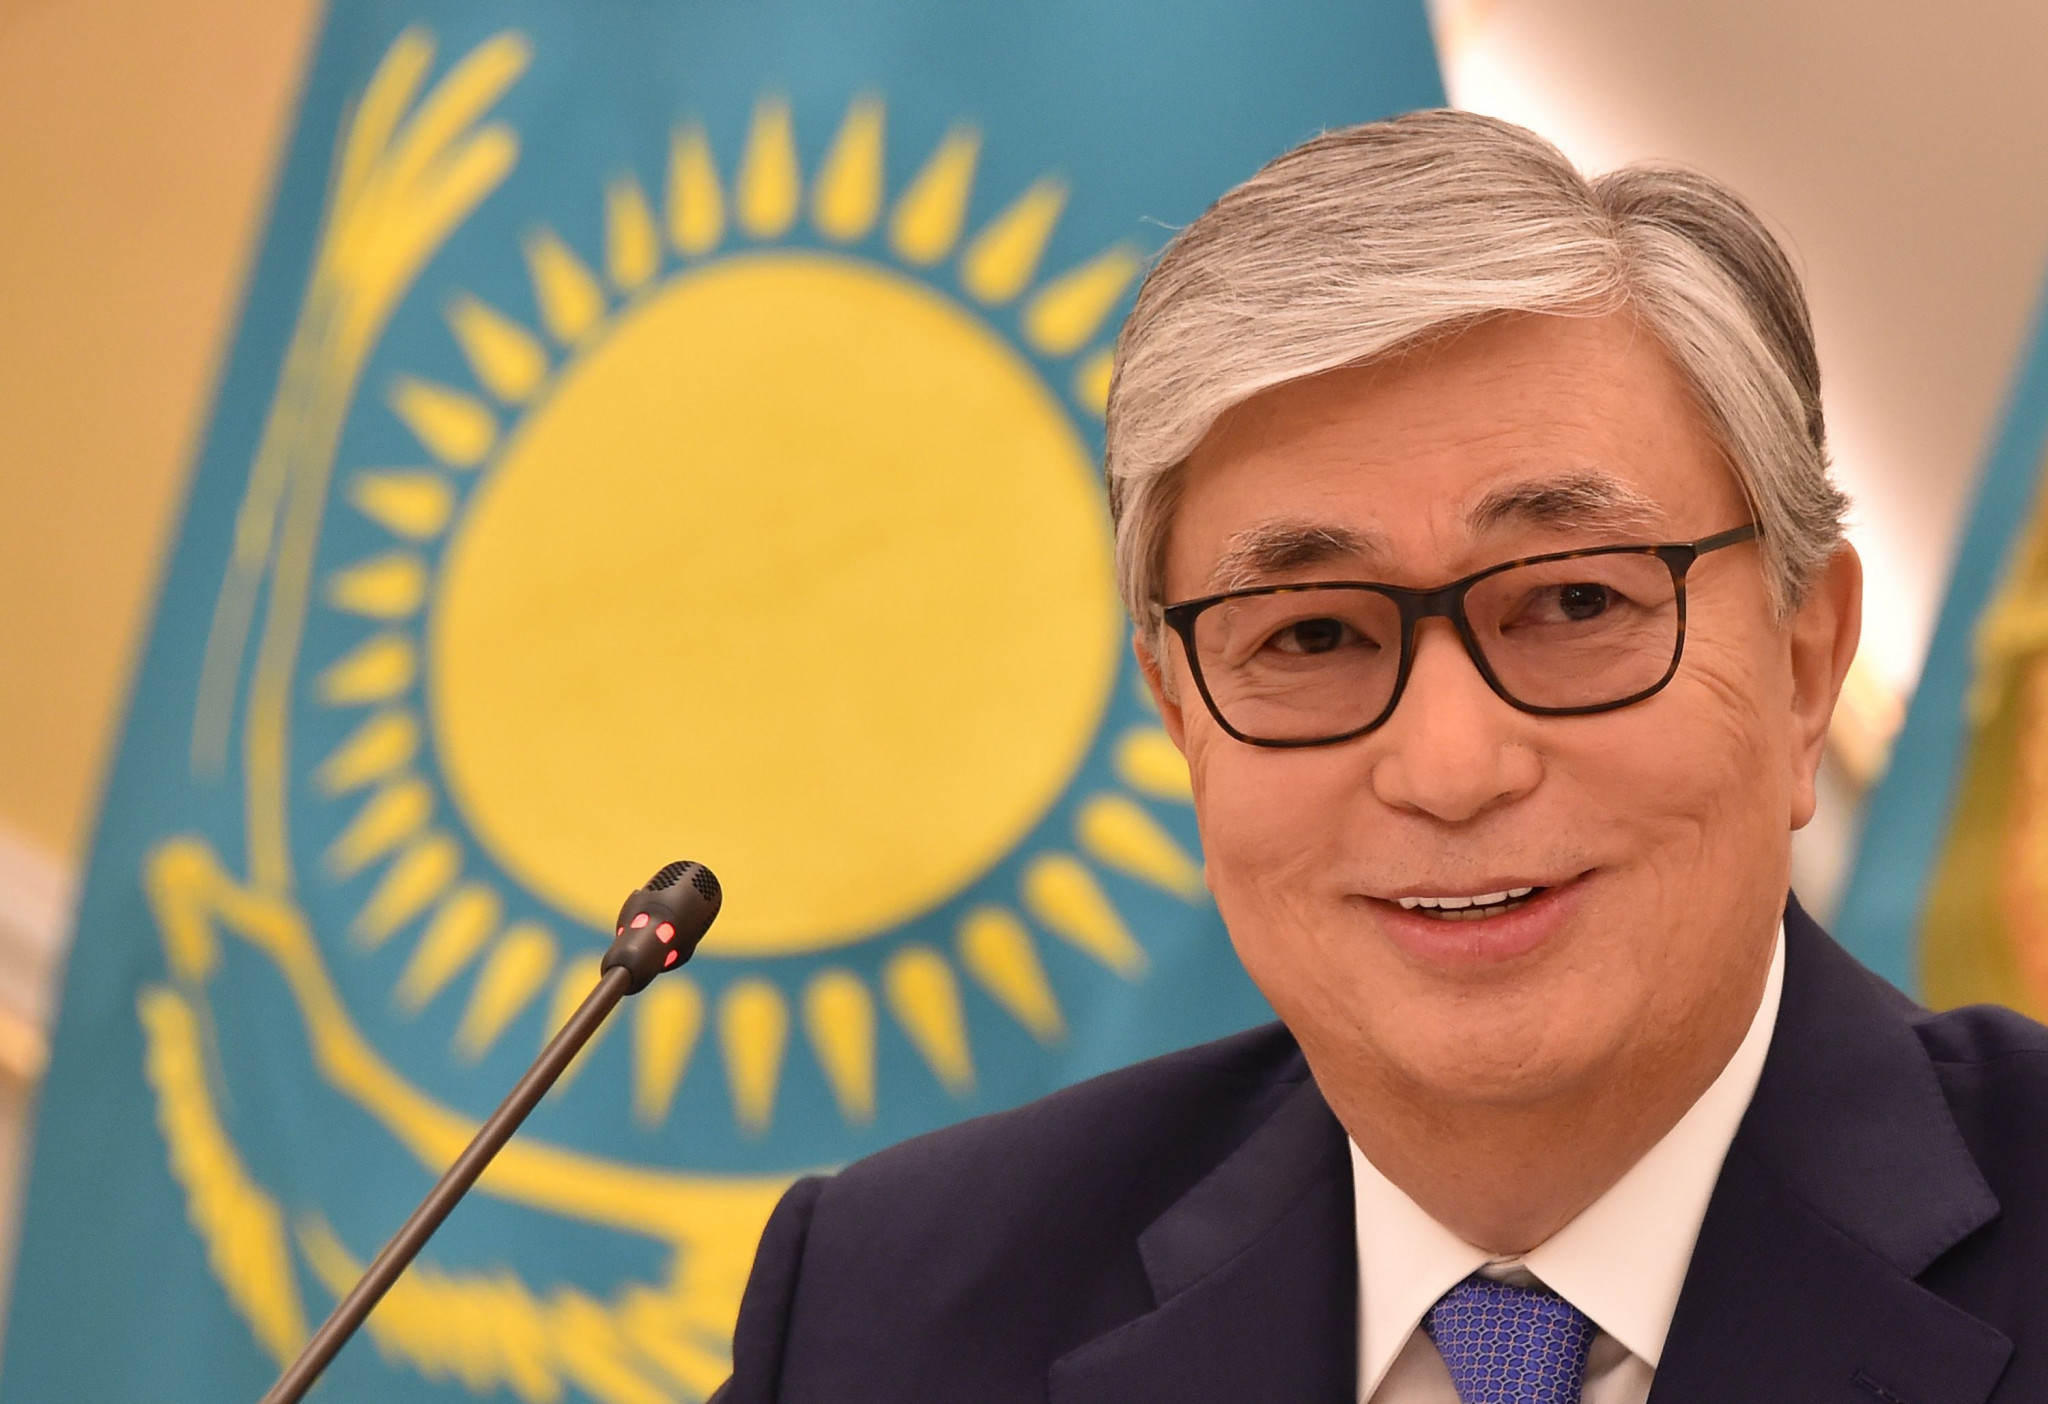 Kazakhstan President meets biggest-ever Paralympic team set for Tokyo 2020